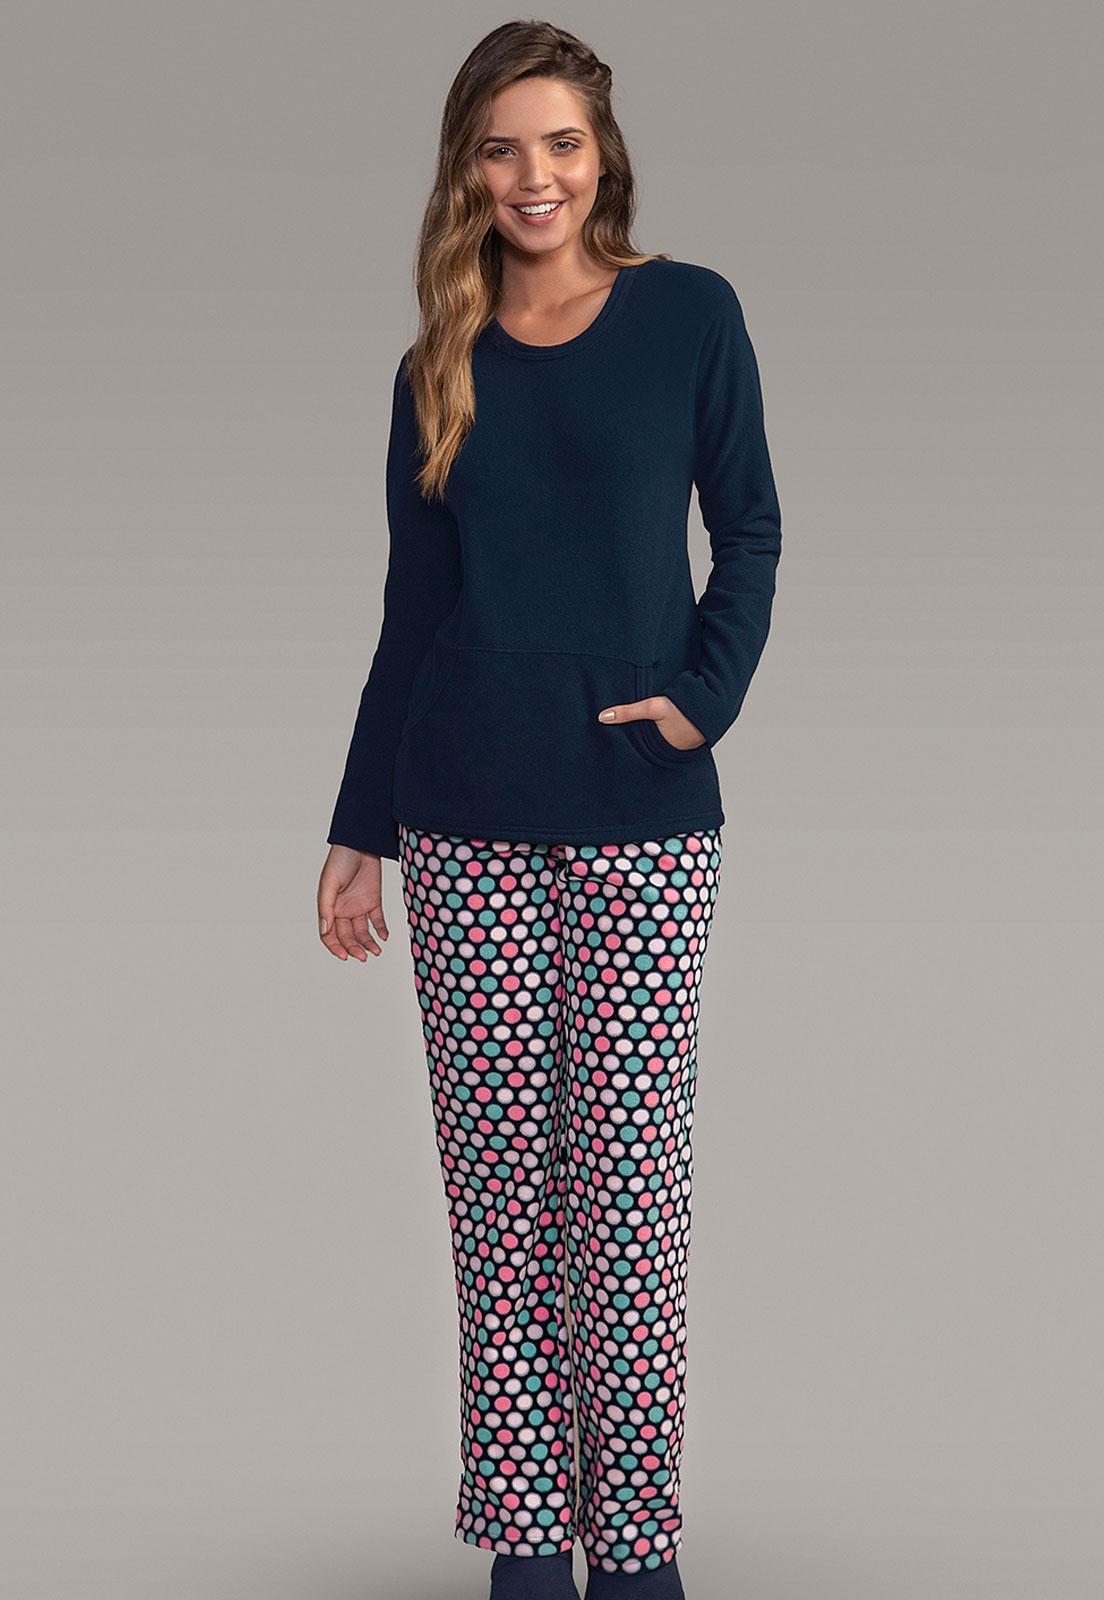 8fa96cecb Pijama Feminino Soft Bolinhas 151029 Lua Encantada - Le Lingerie